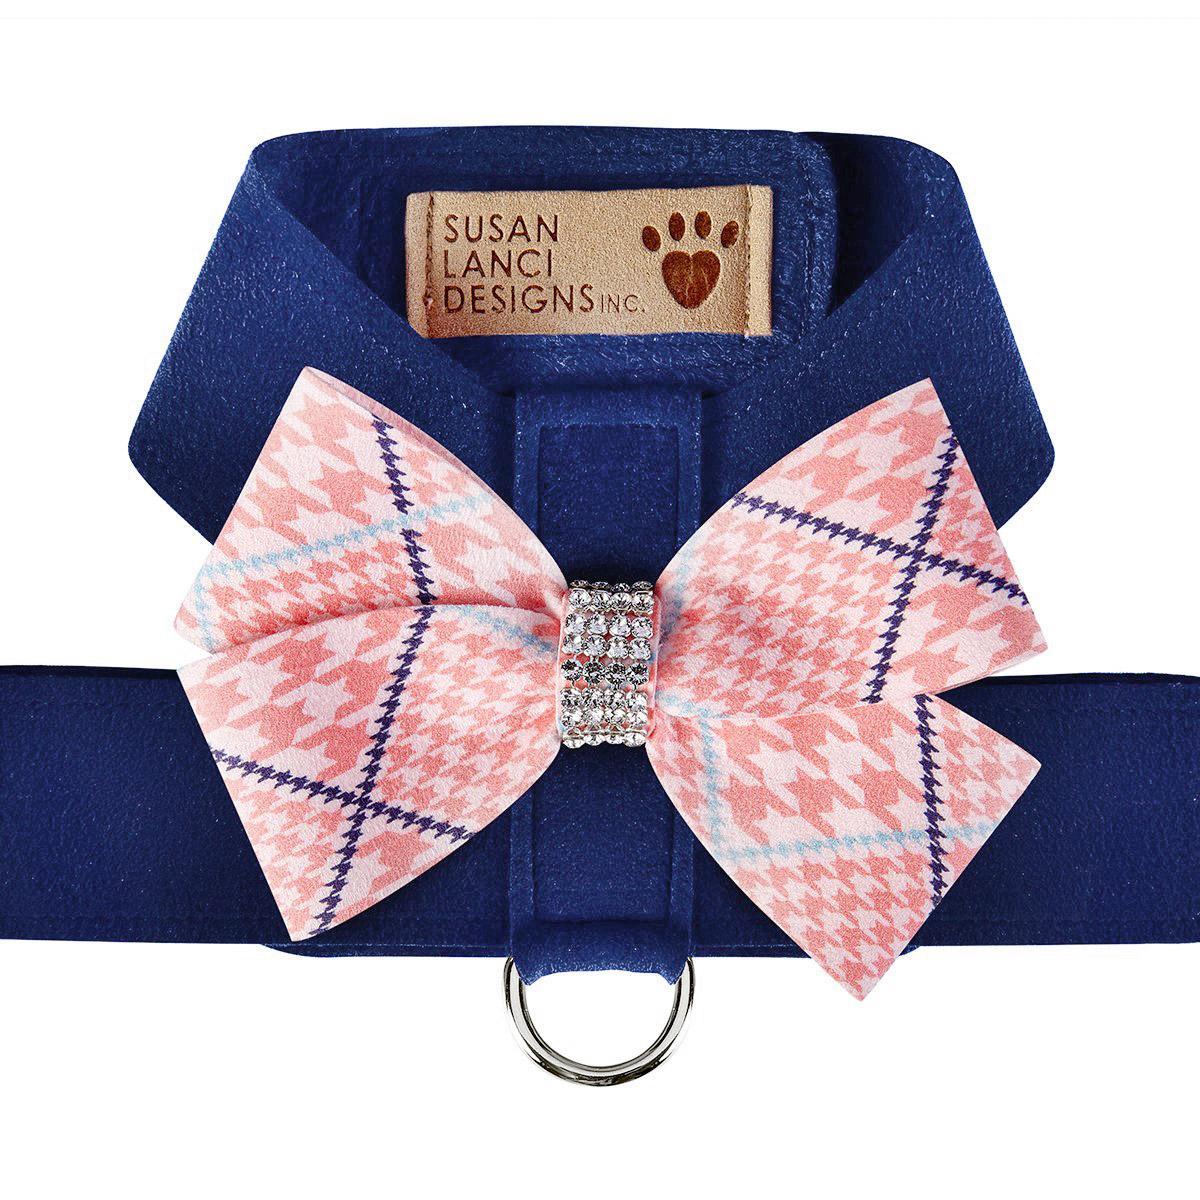 Peaches & Cream Glen Houndstooth Nouveau Bow Tinkie Dog Harness by Susan Lanci - Indigo